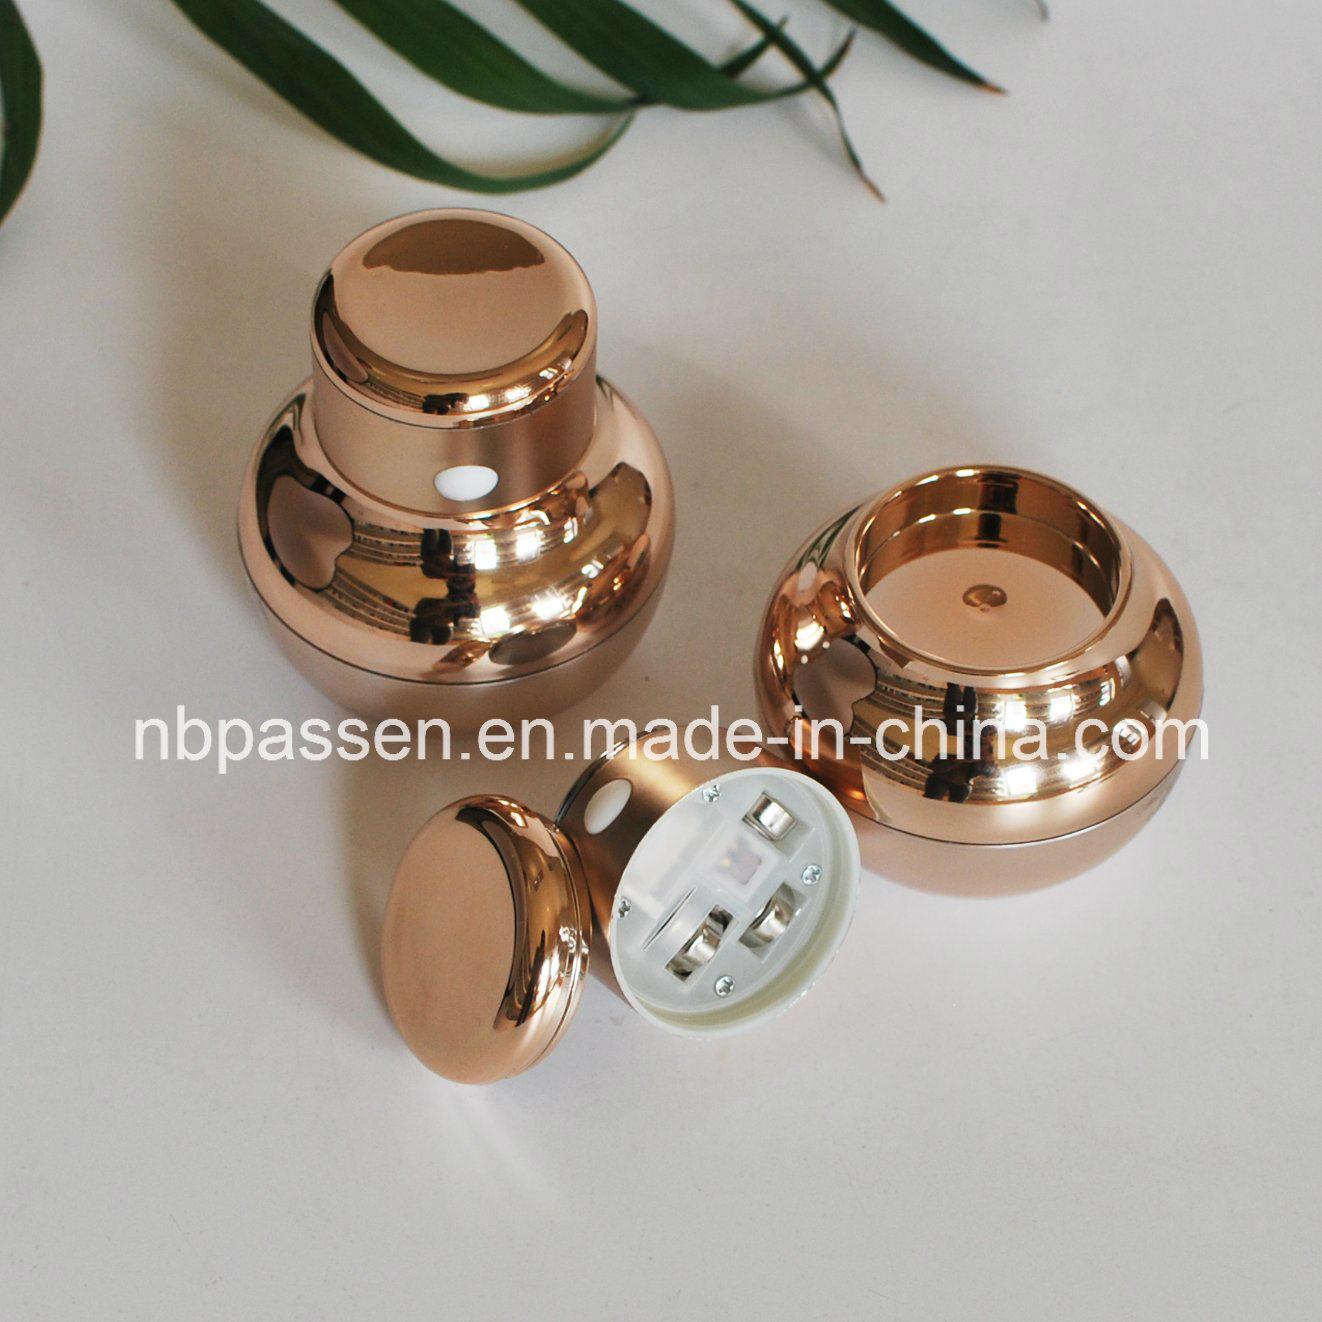 Luxury Electric Shake Massage Acrylic Cream Jar for Cosmetics (PPC-NEW-112)